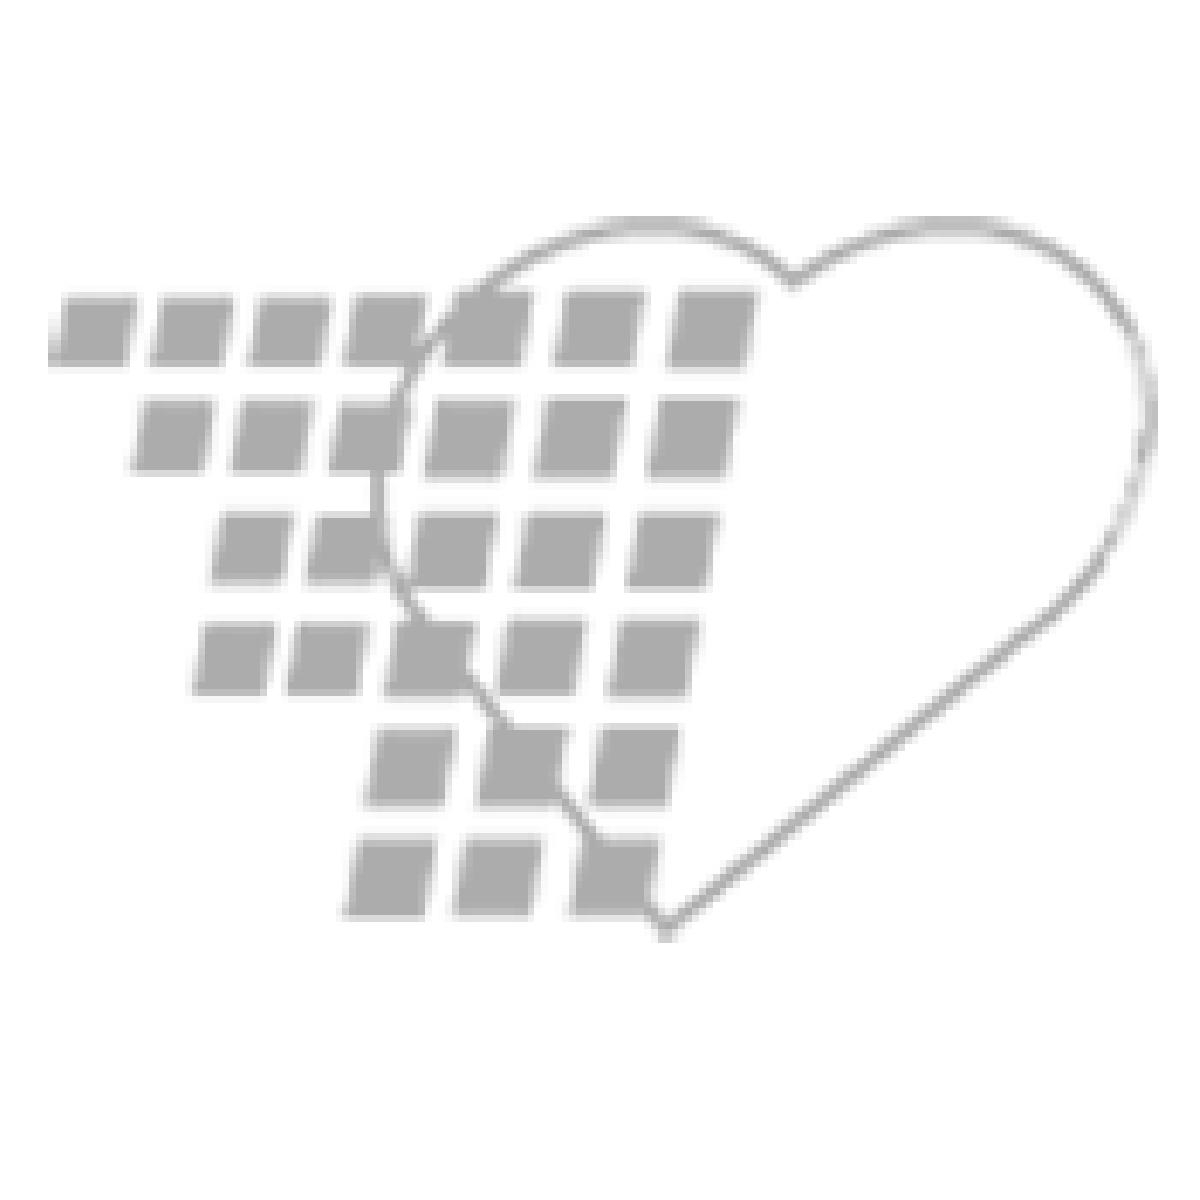 06-93-1102 Demo Dose® Atropin Simulated Code Drug